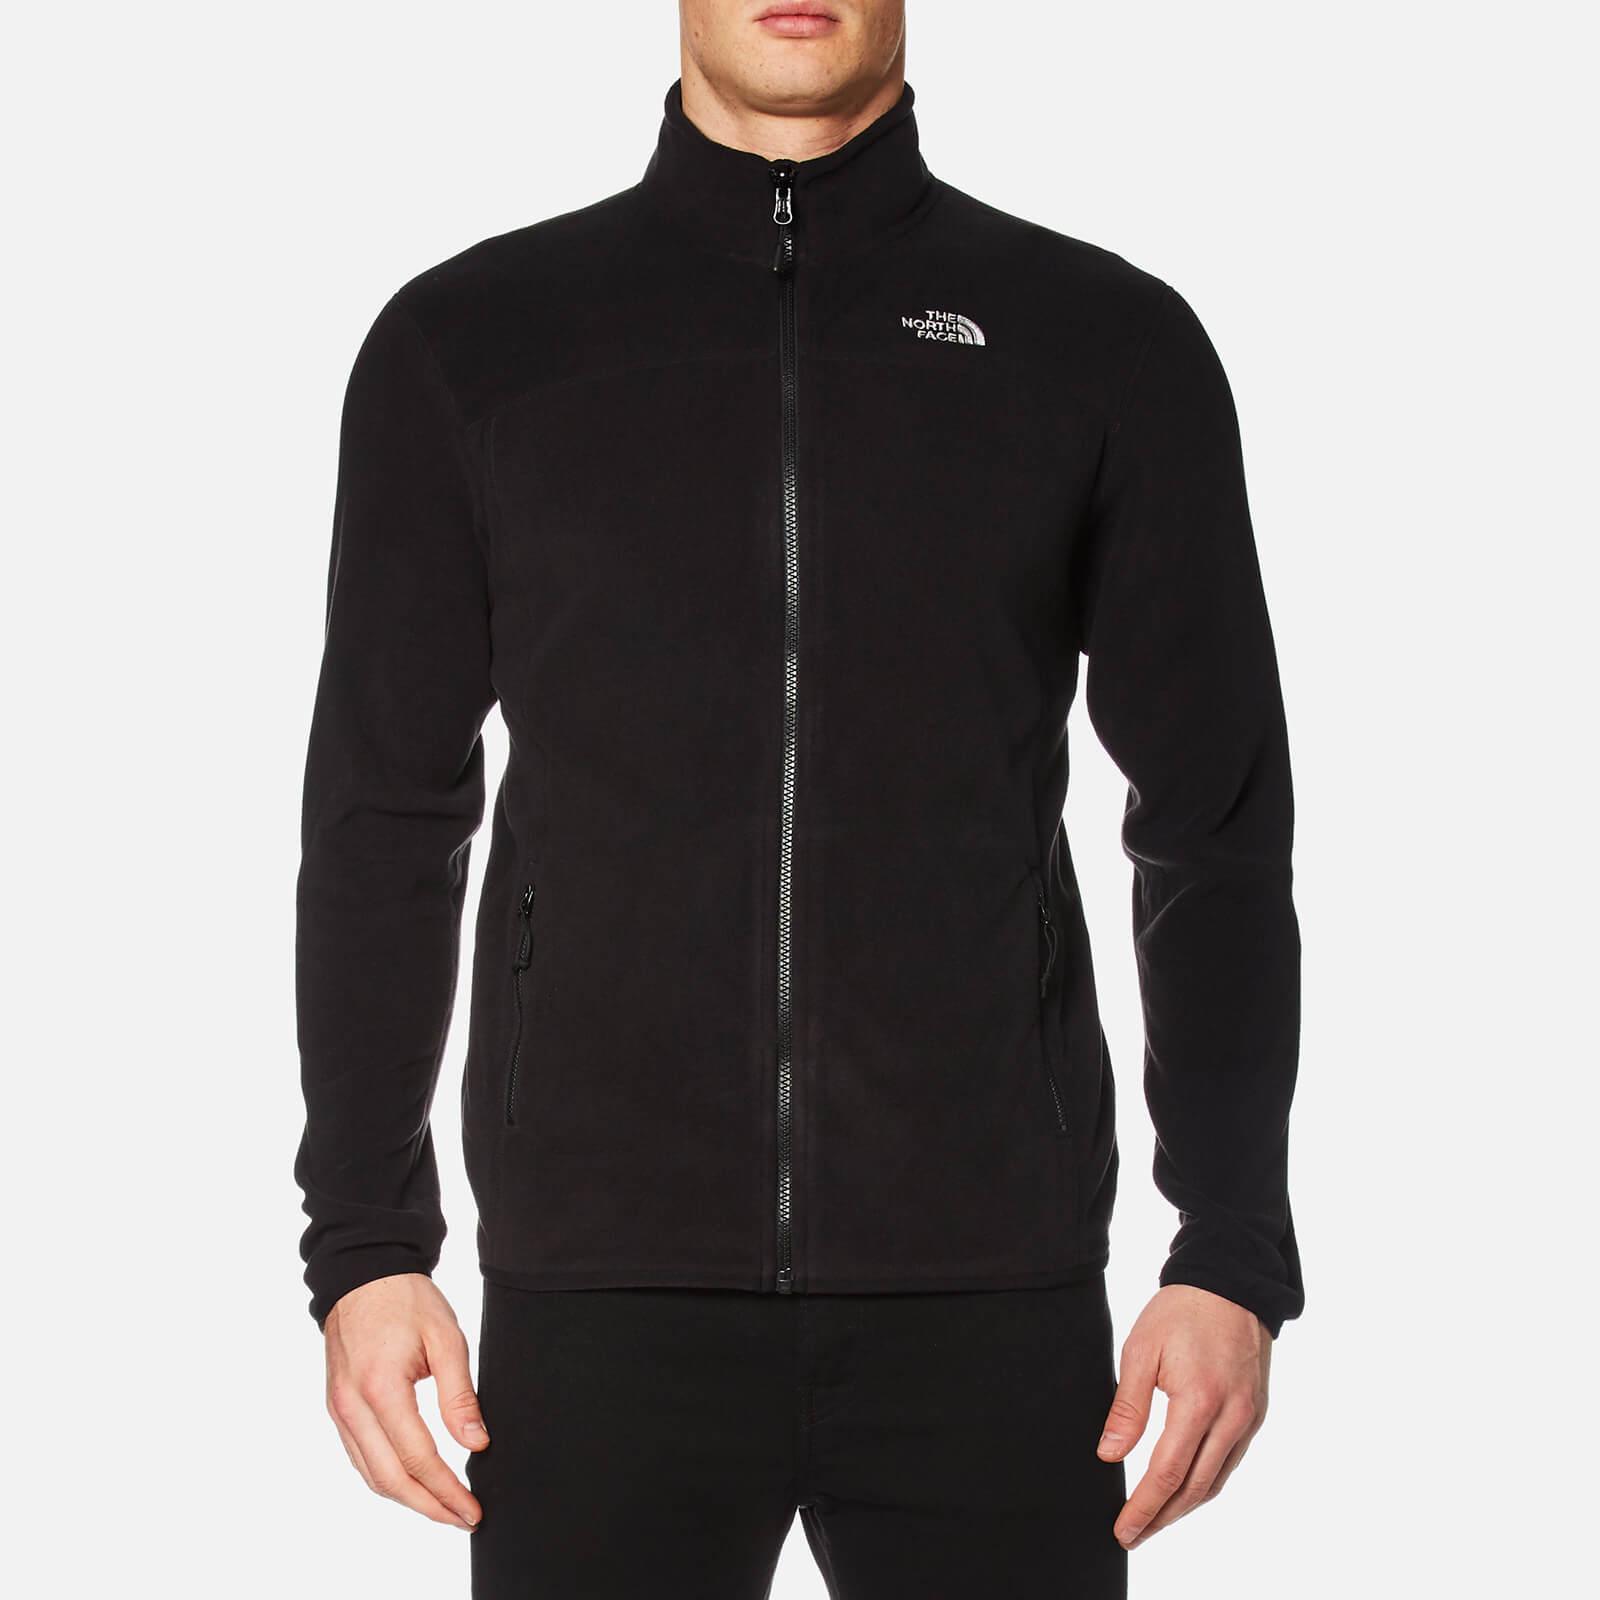 a071aa741cb The North Face Men's 100 Glacier Full Zip Fleece - TNF Black Clothing |  TheHut.com